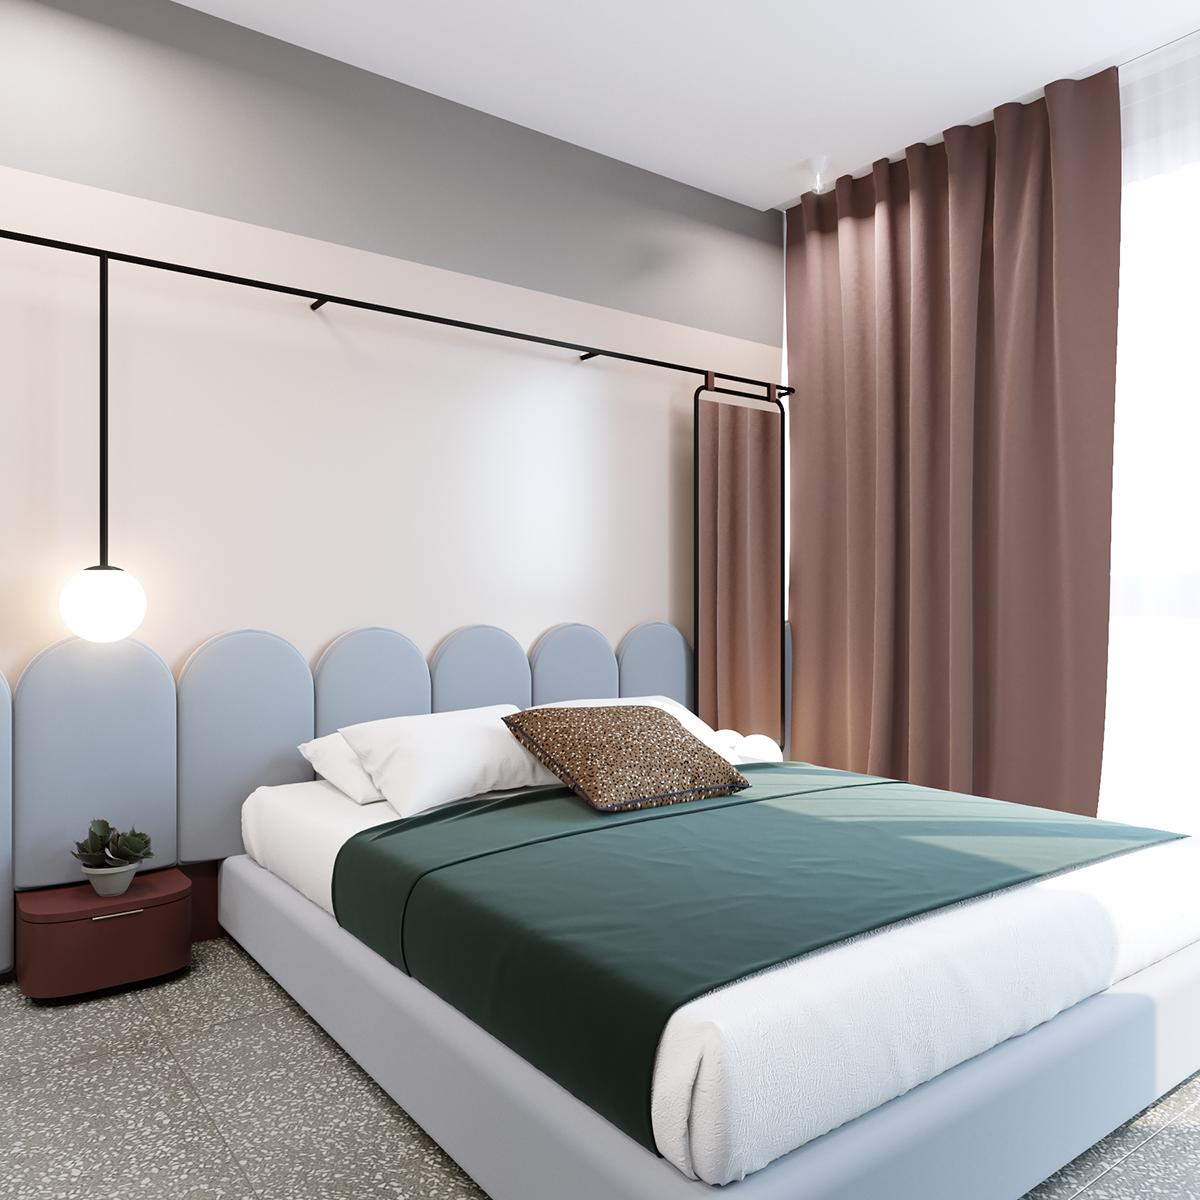 45 sq meters apartment on behance boomroom in 2019 bedroom rh pinterest com